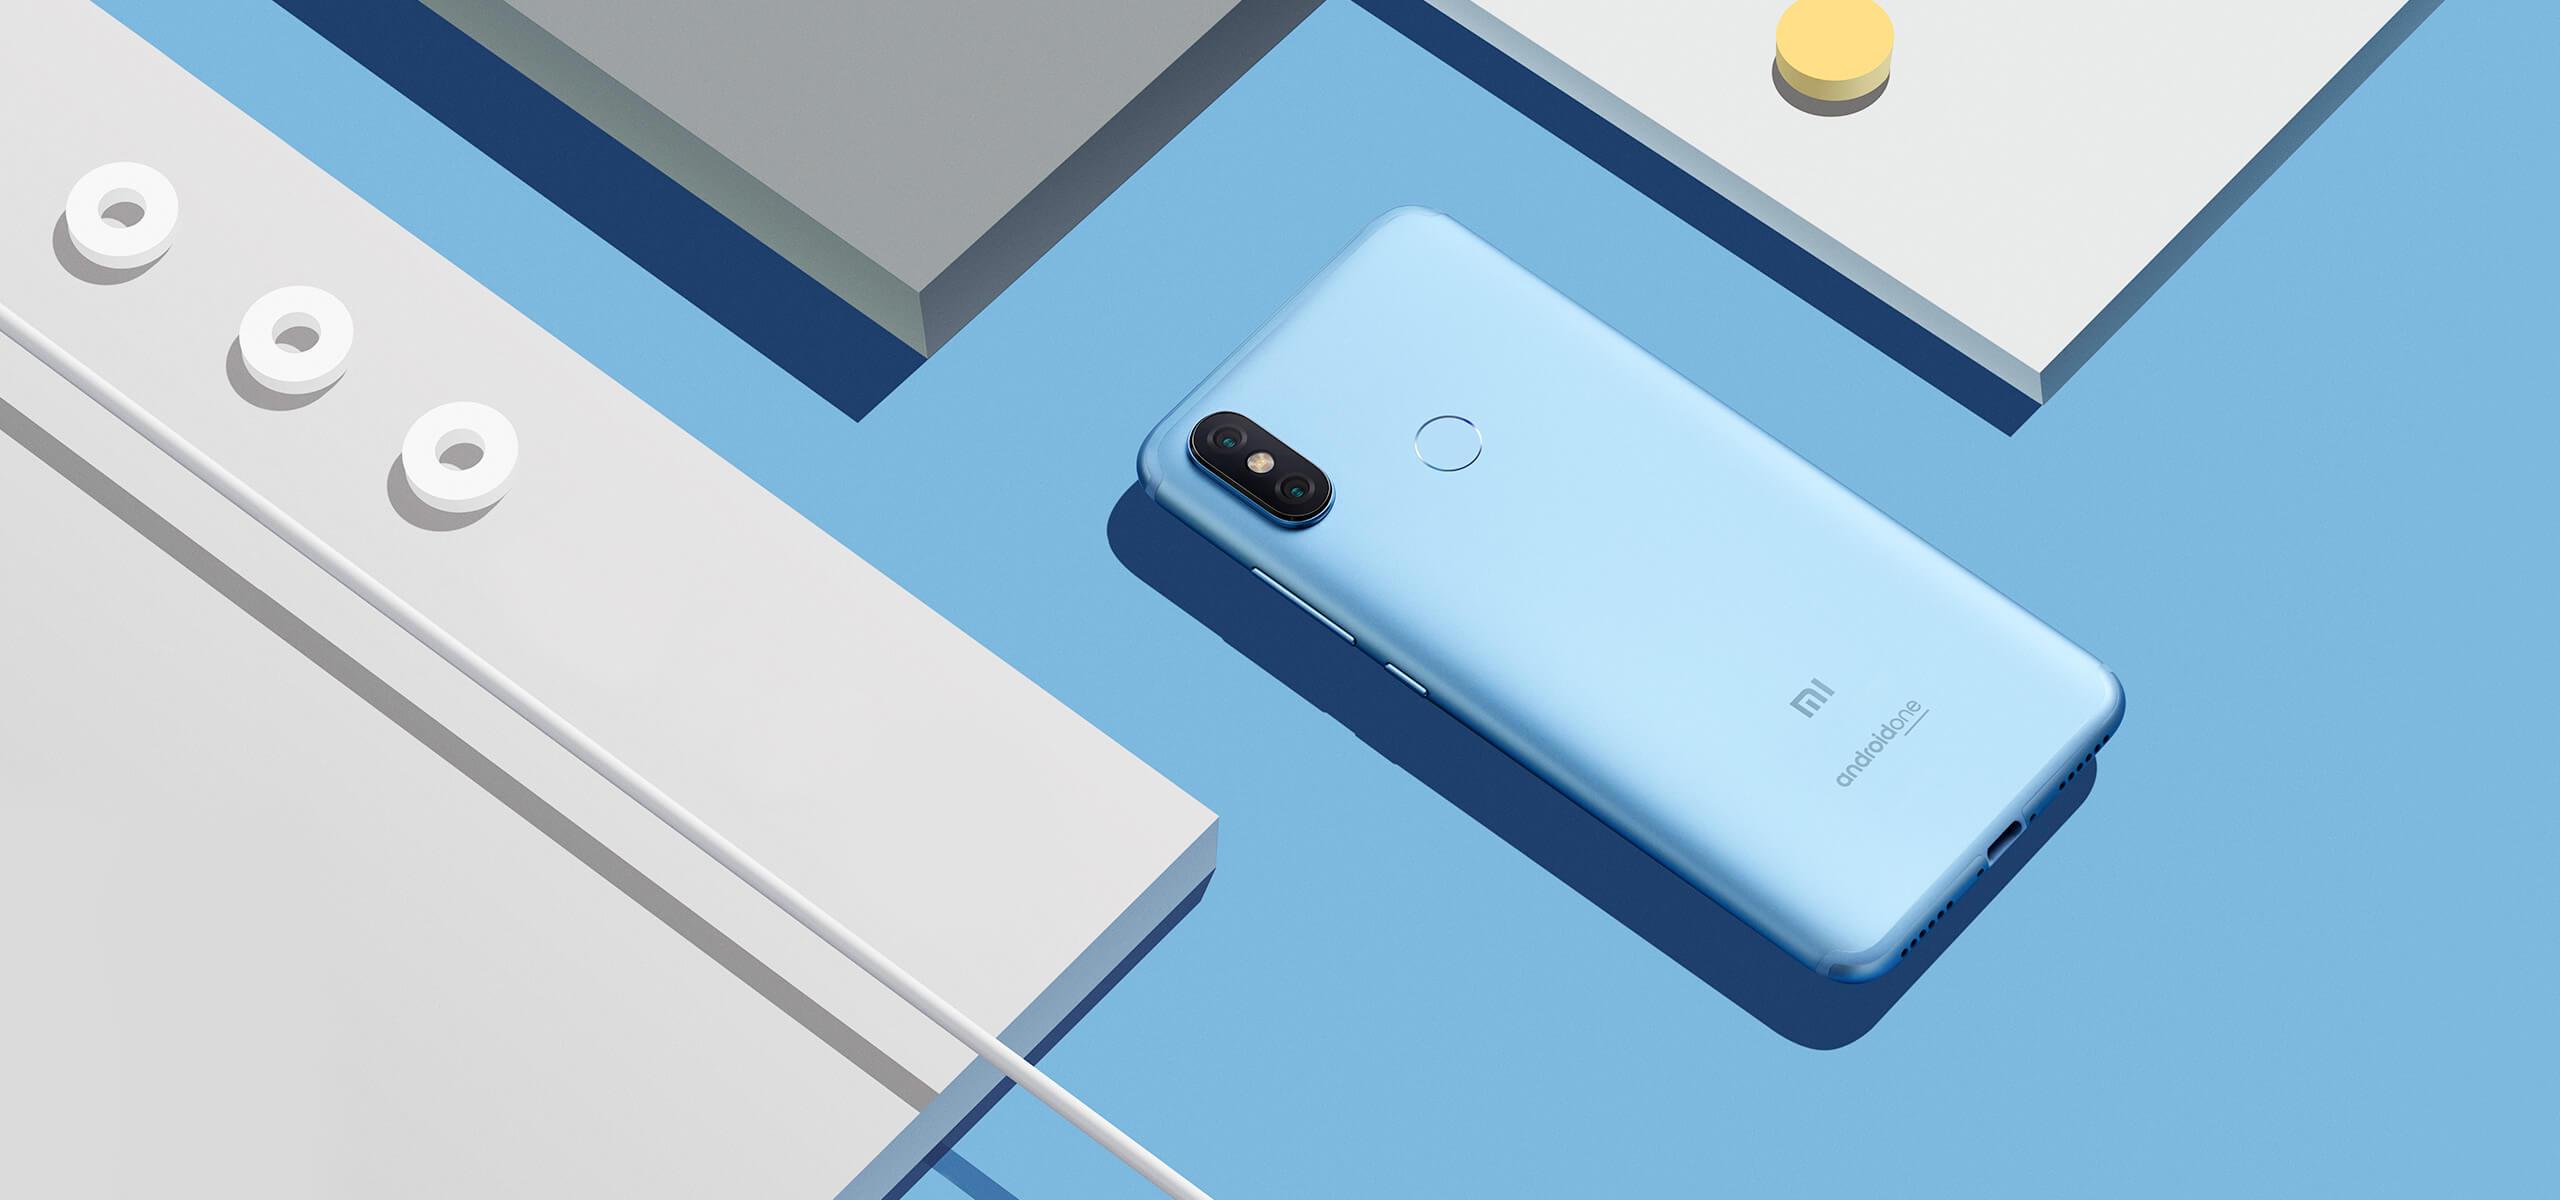 Nokia 7 Plus vs Xiaomi MI A2: the battle for mid-segment